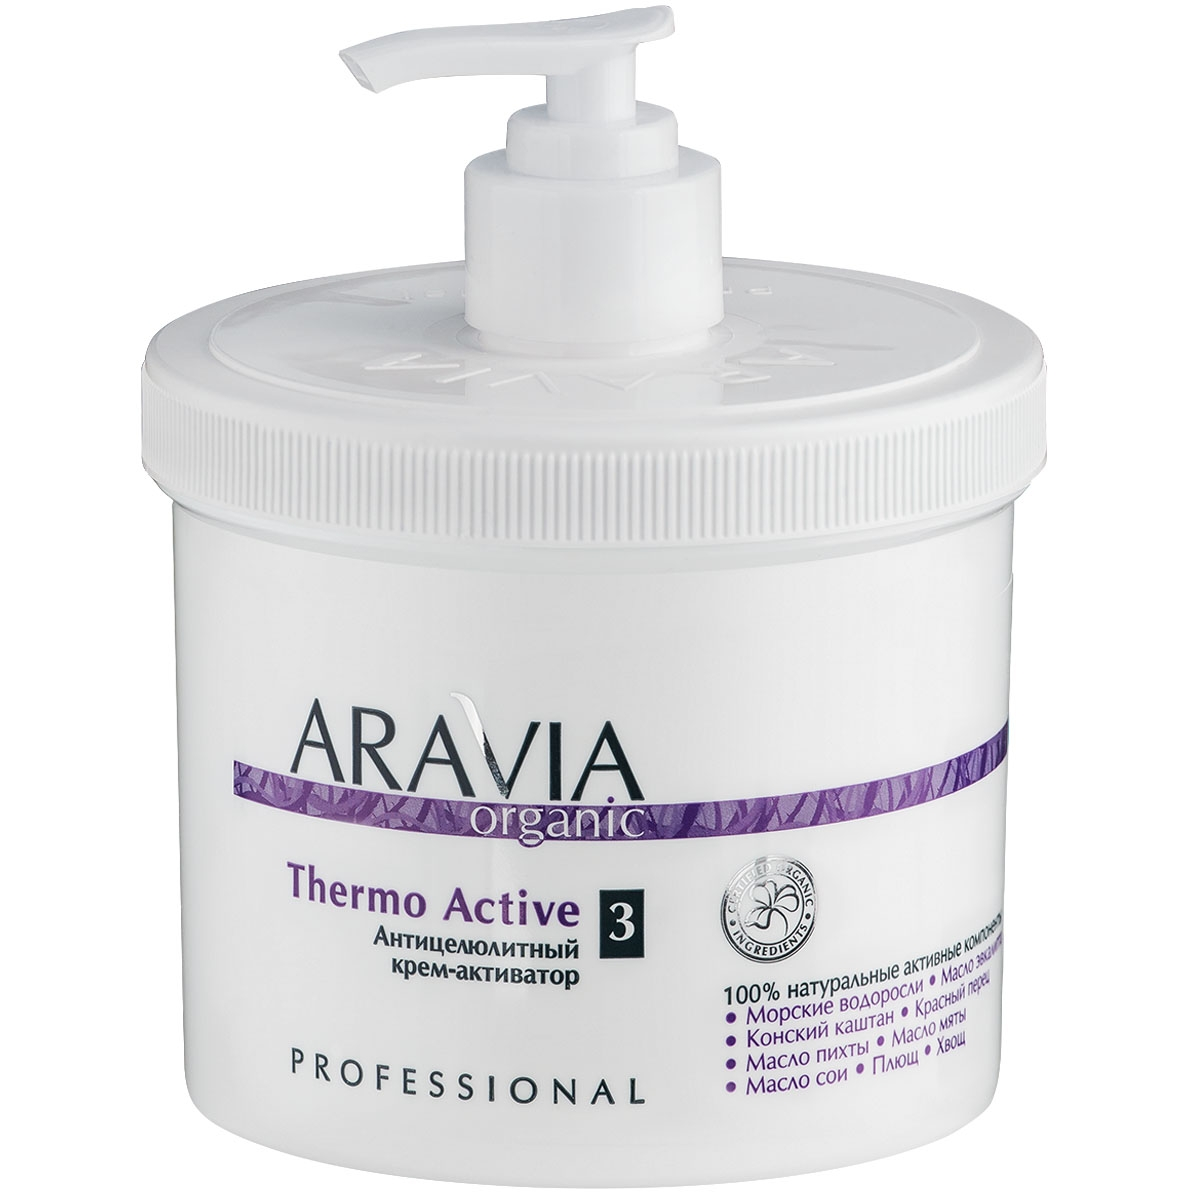 ARAVIA Крем-Активатор Organic Thermo Active Антицелюлитный, 550 мл